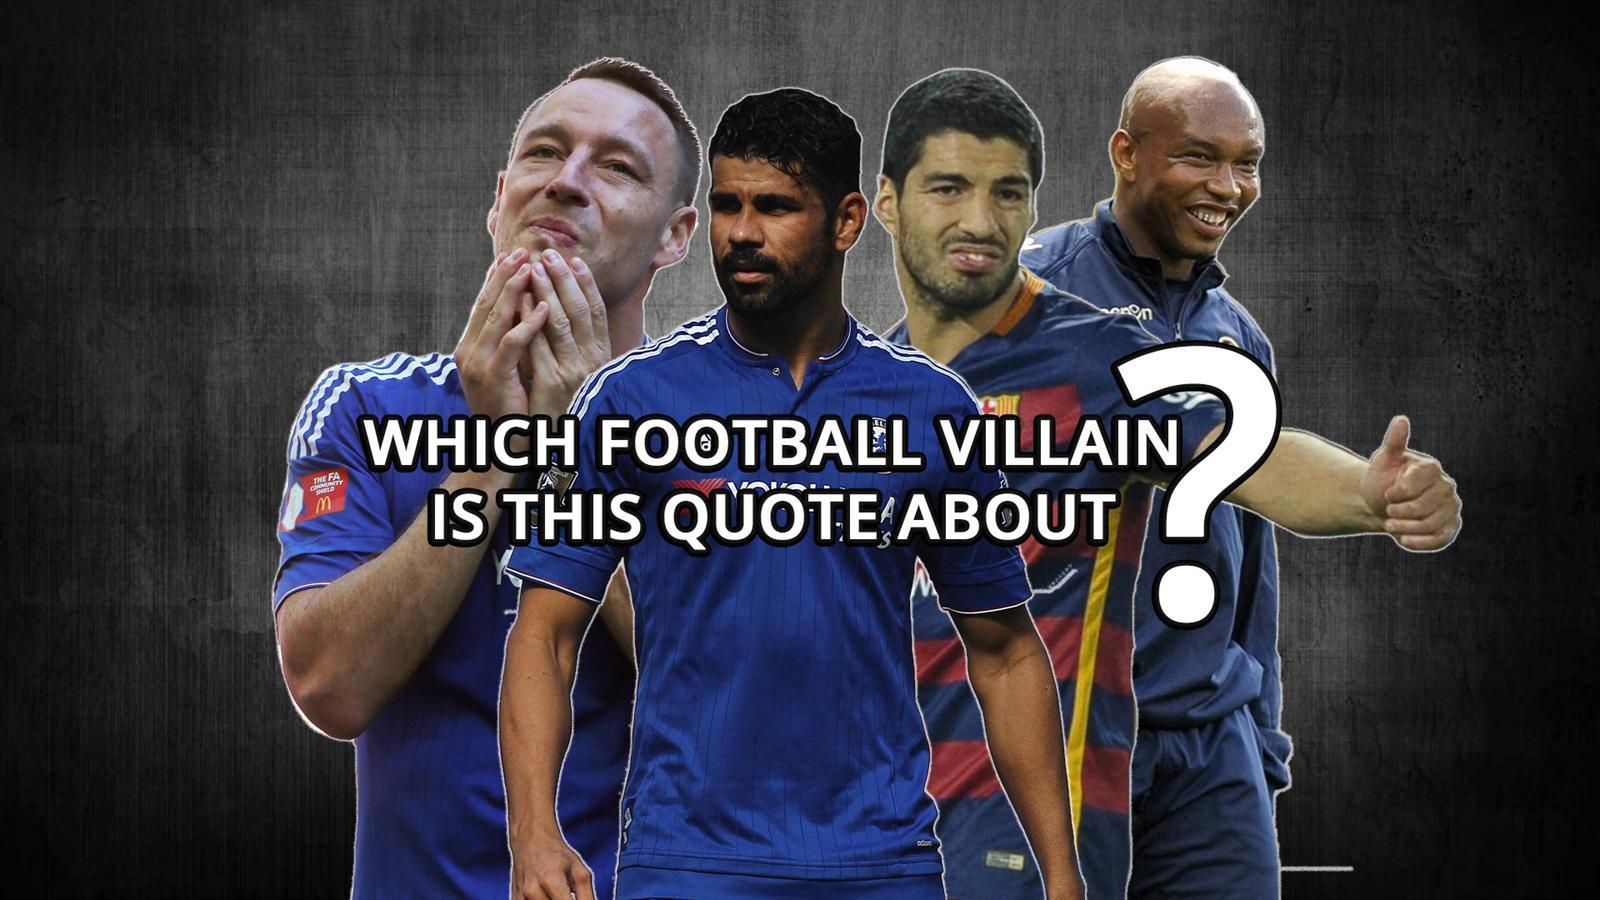 John Terry, Diego Costa, Luis Suarez and El Hadji Diouf